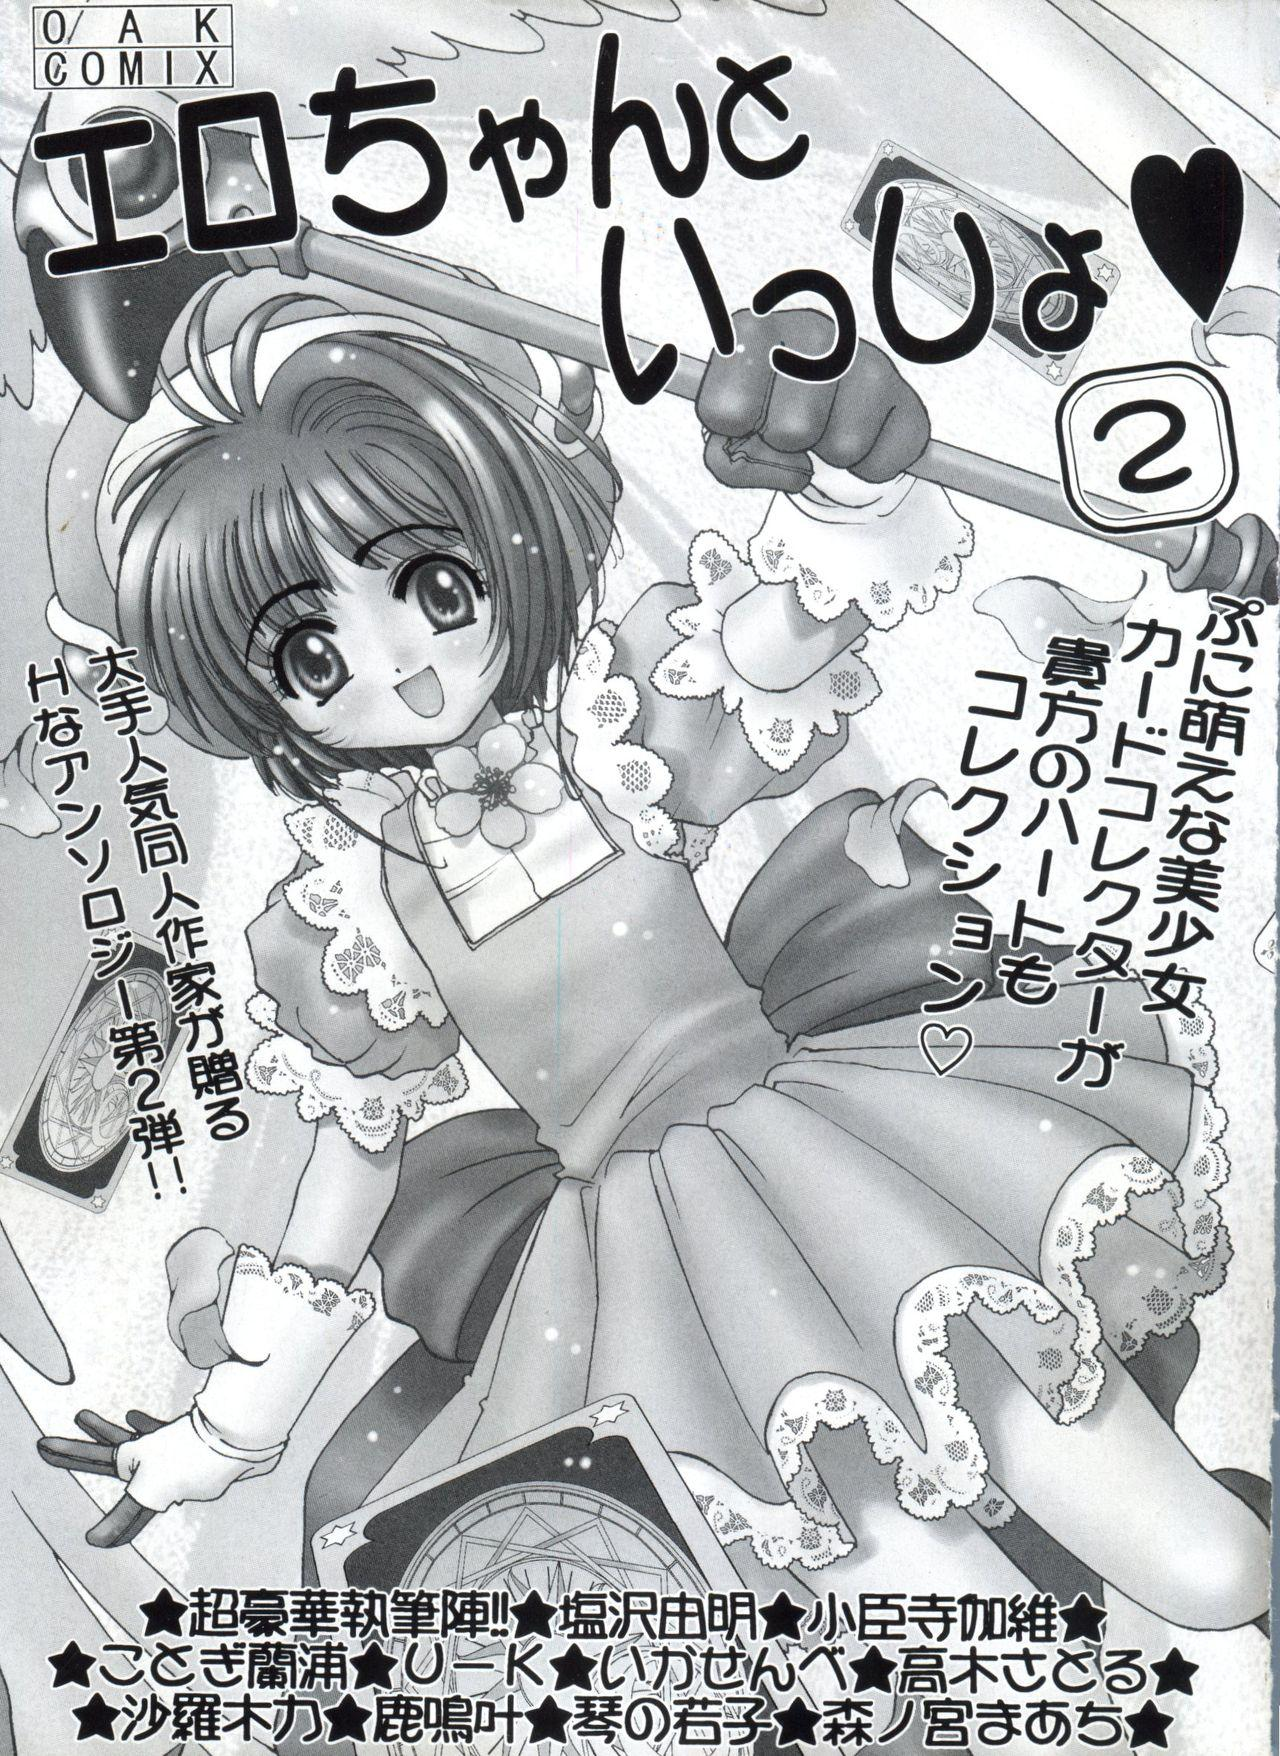 Ero-chan to Issho 2 3